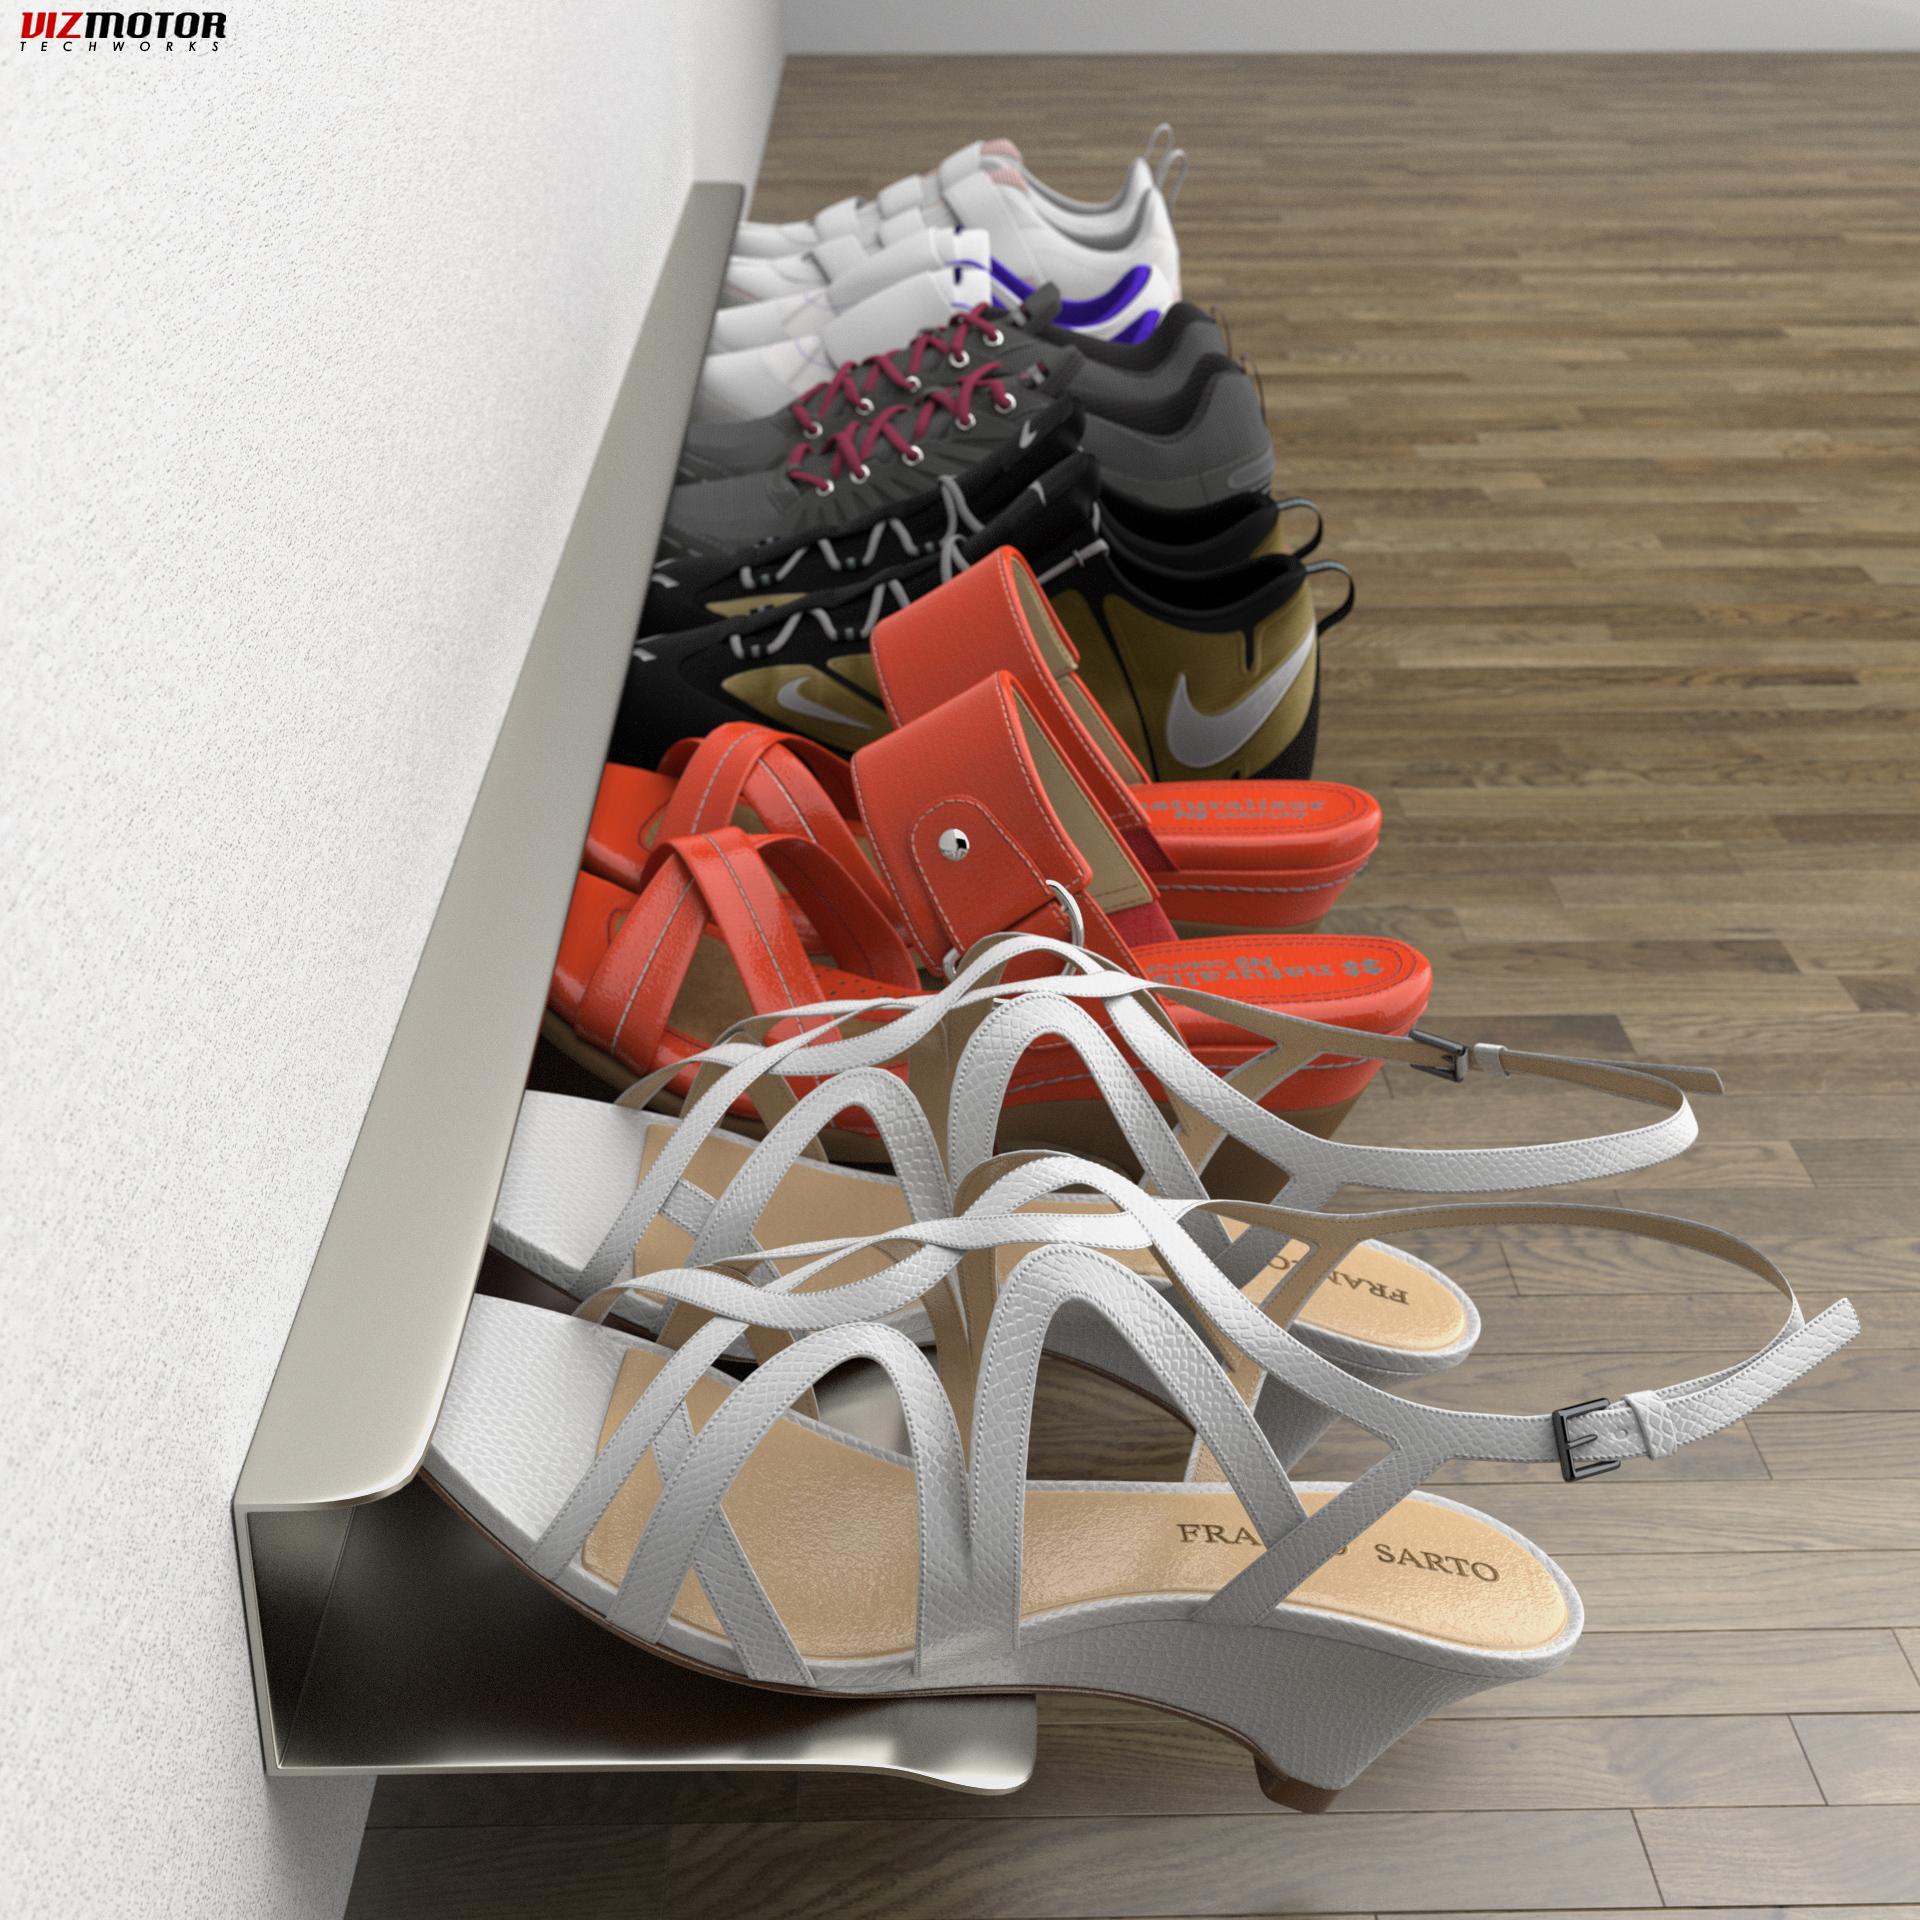 VizMotor_Shoes_1